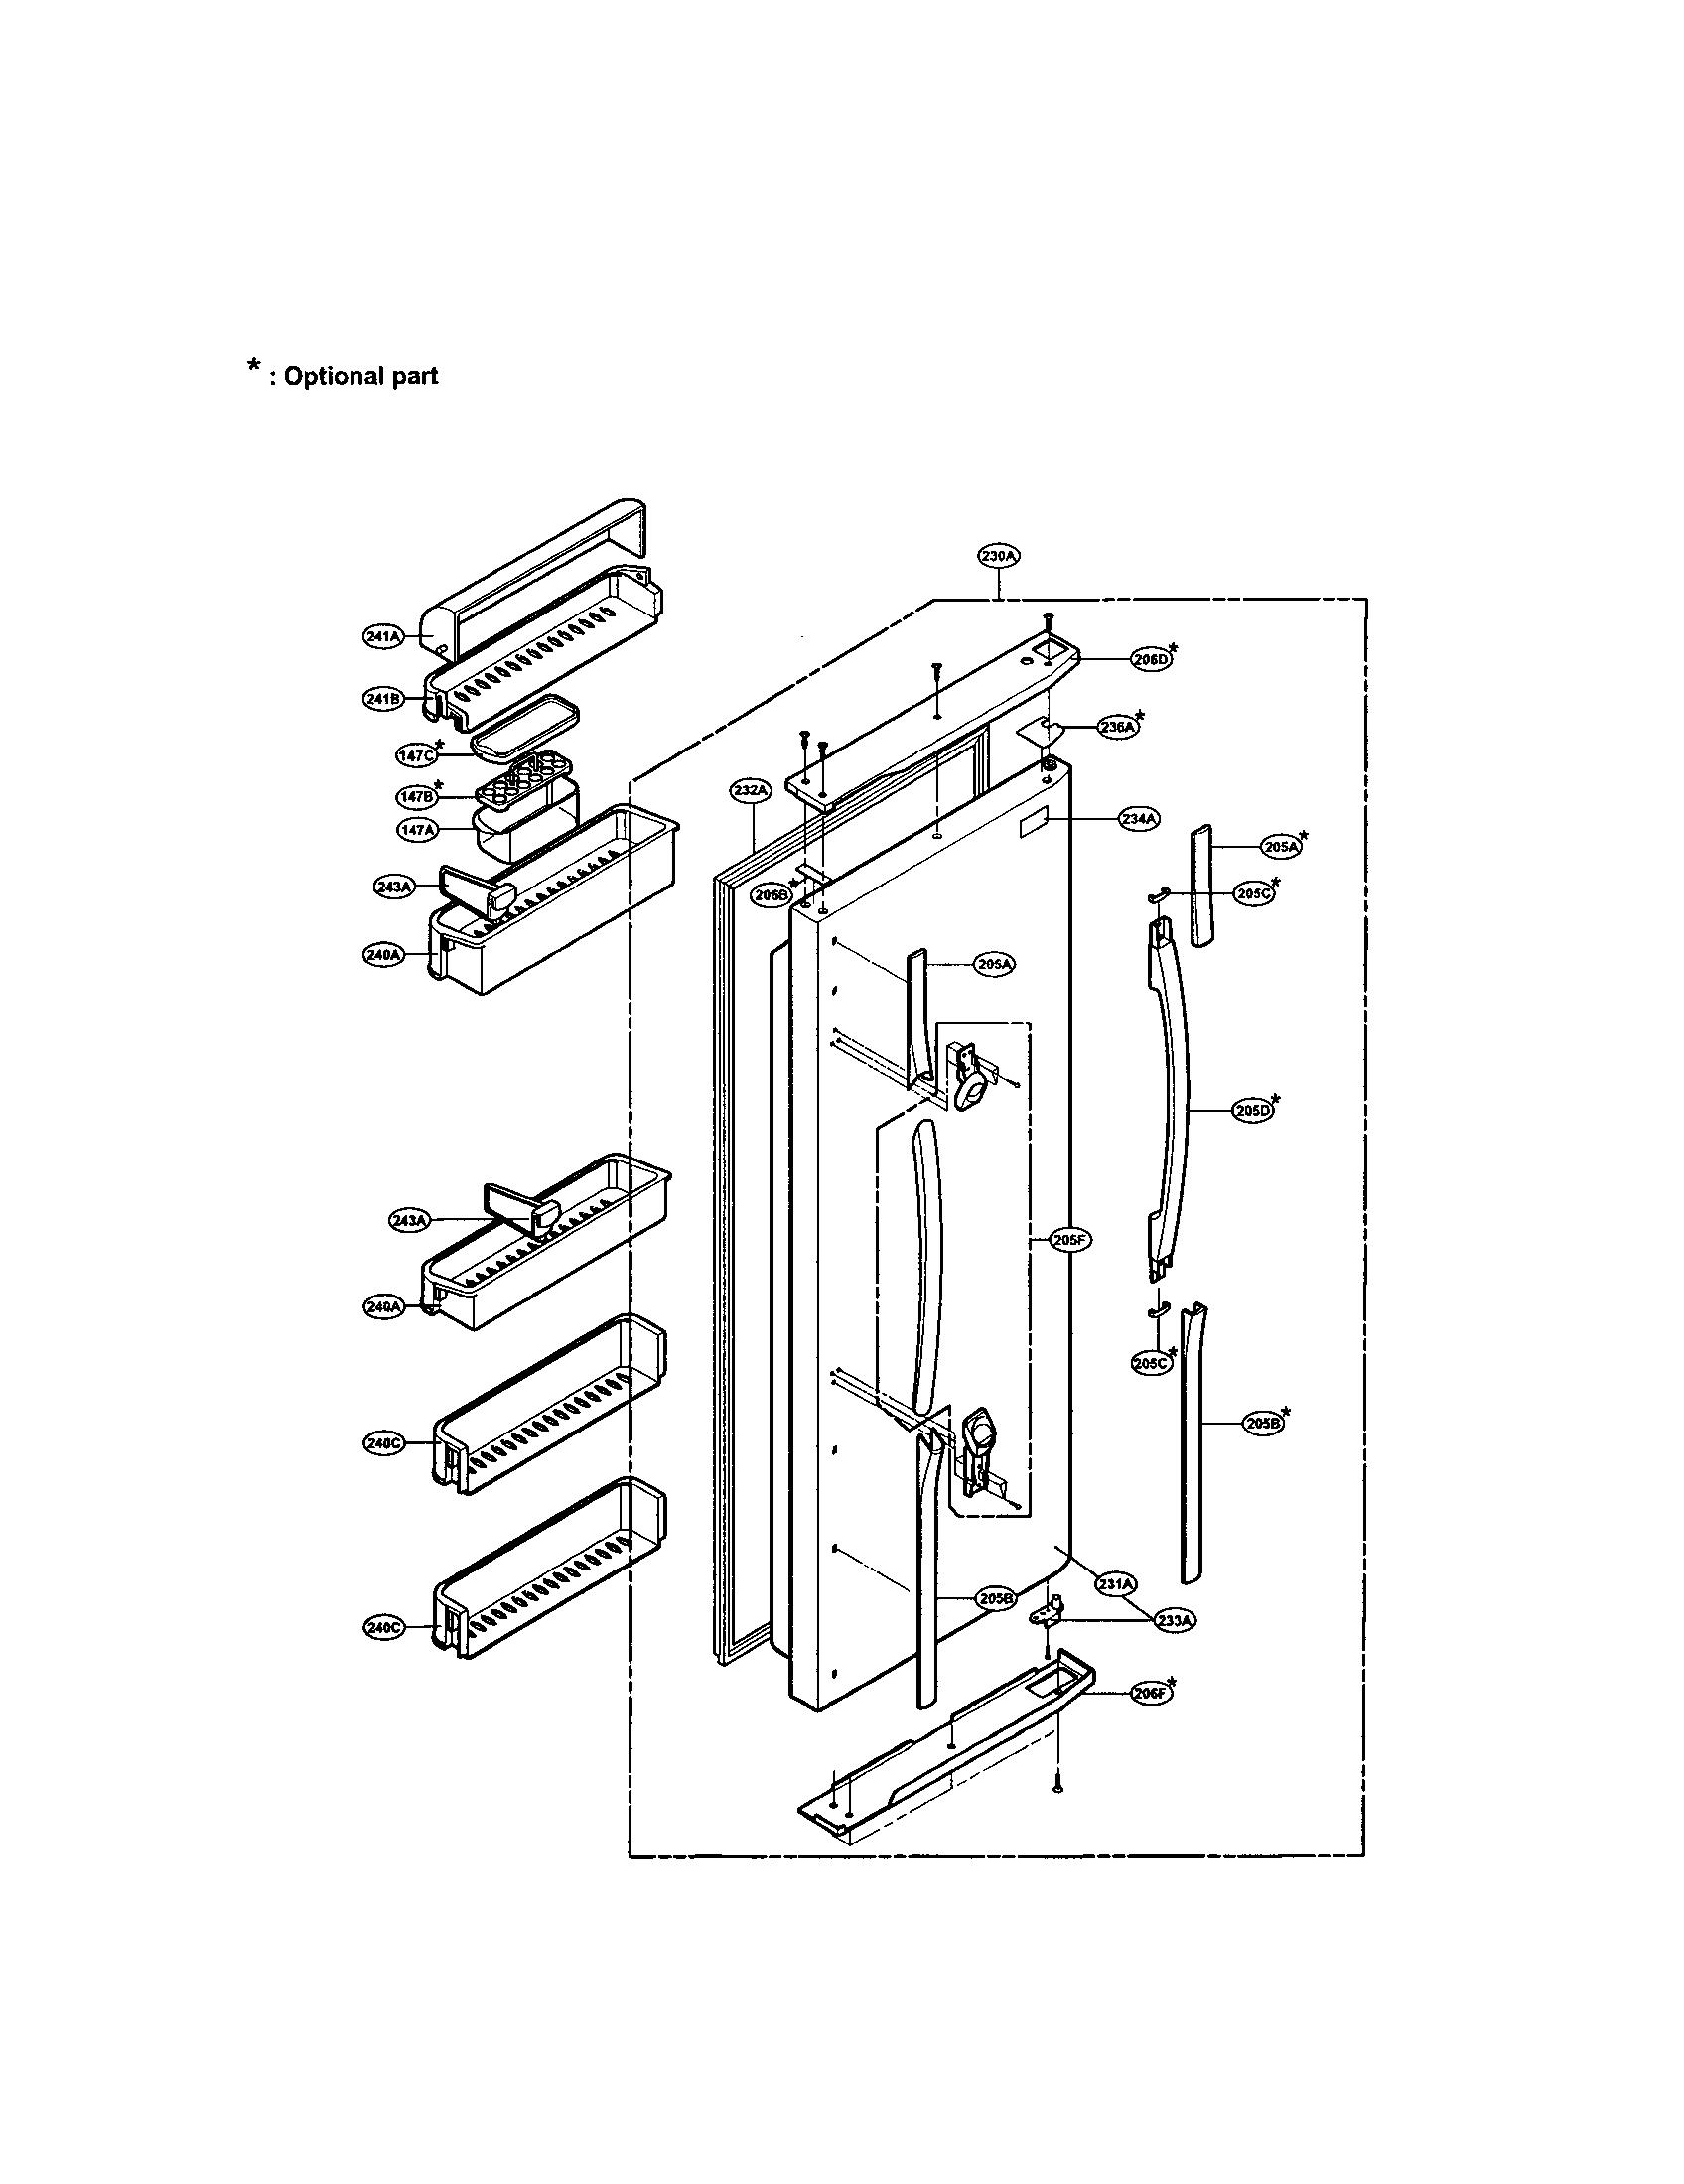 Refrigerator Parts: Lg Refrigerator Parts Diagram